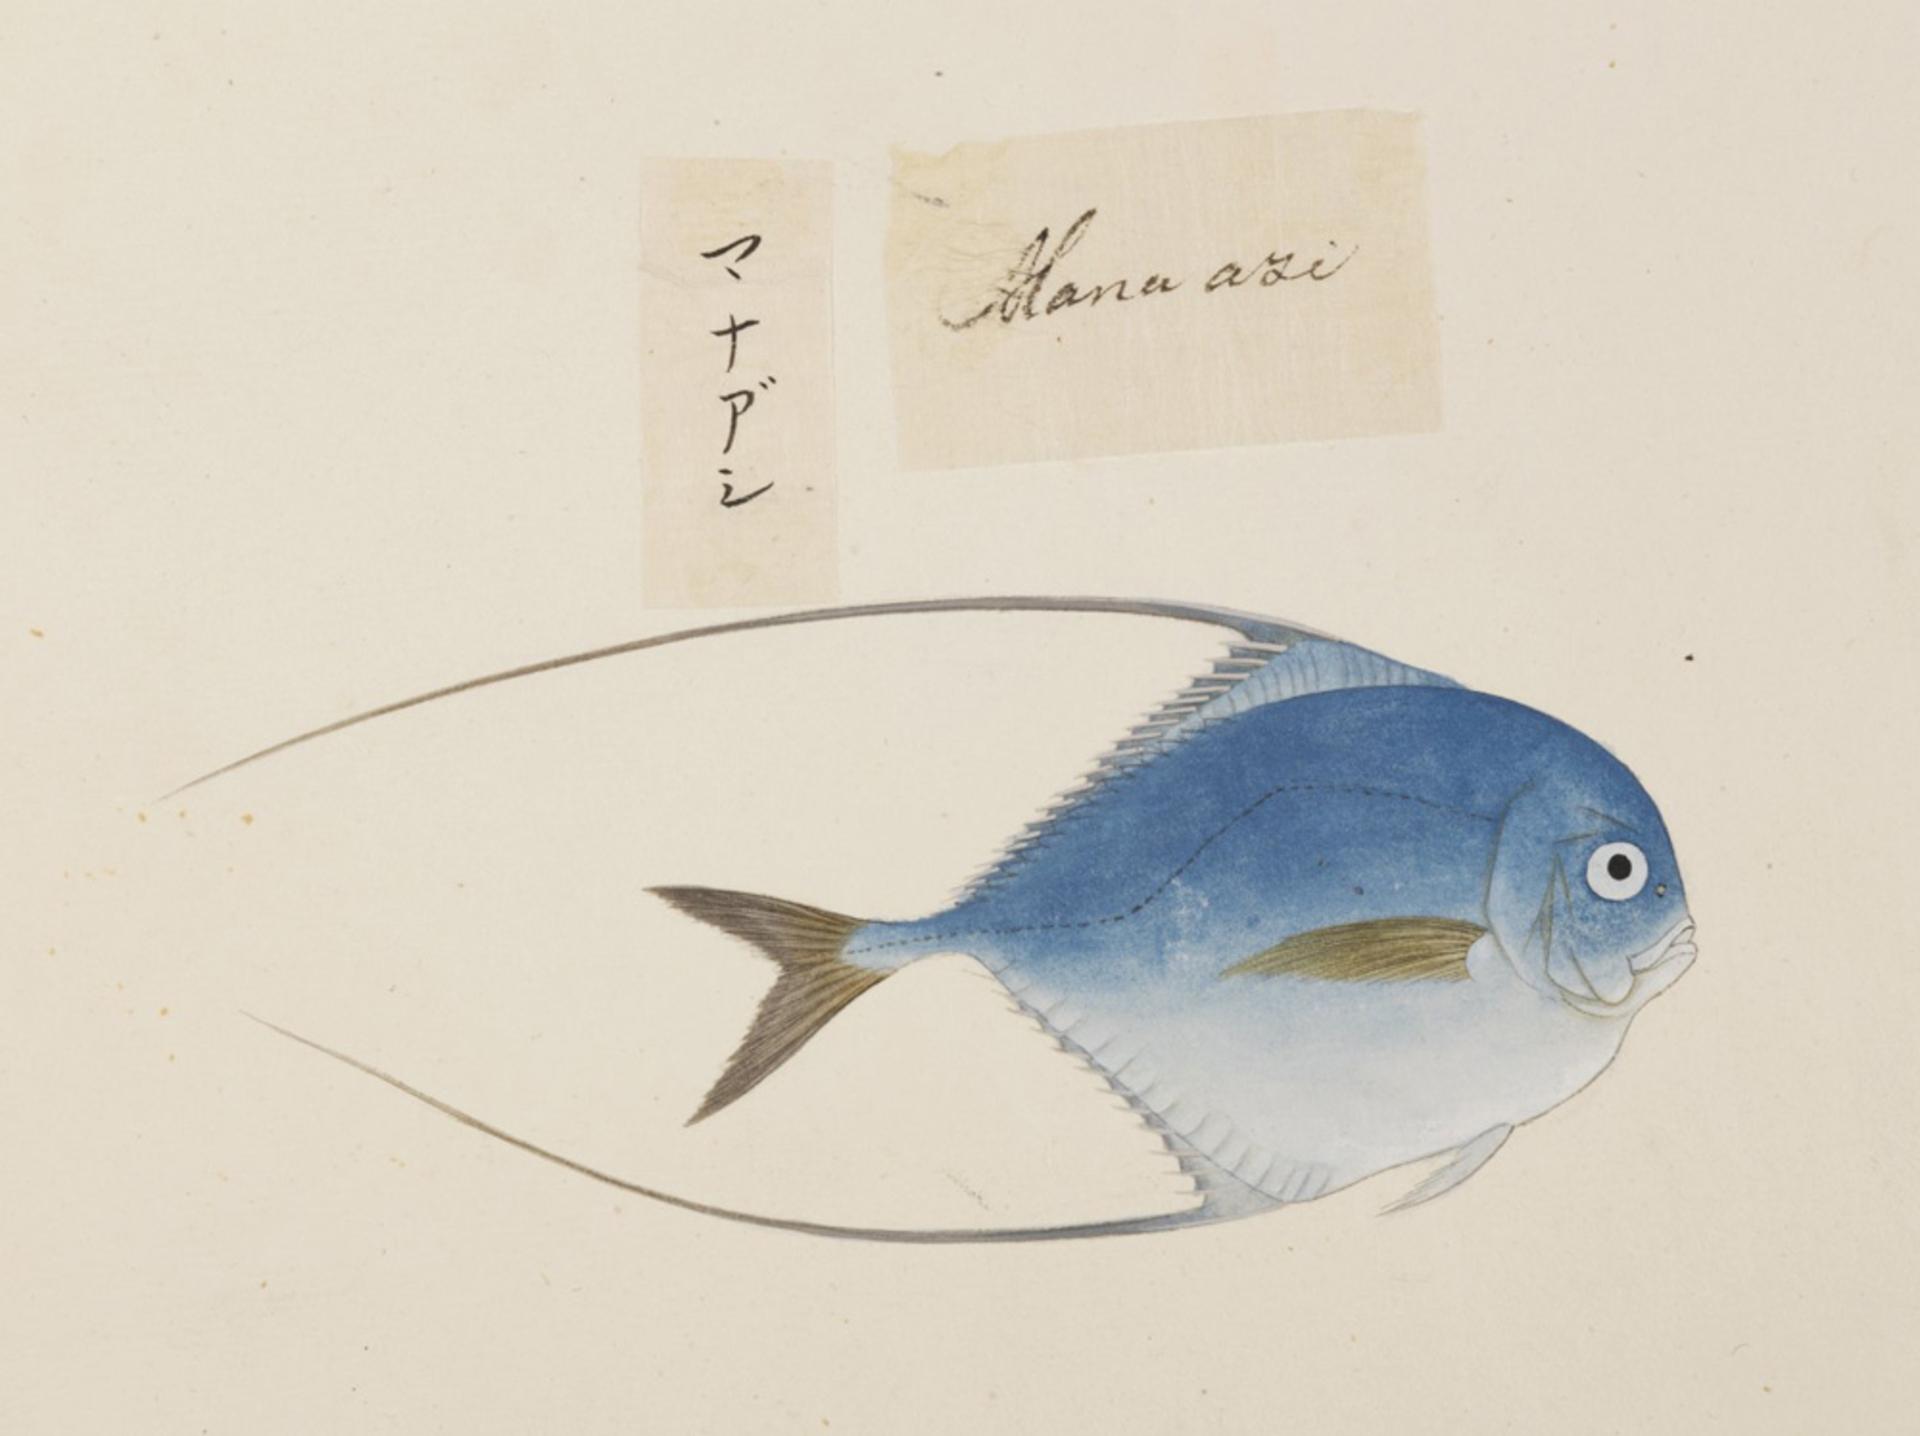 RMNH.ART.516 | Alectis ciliaris